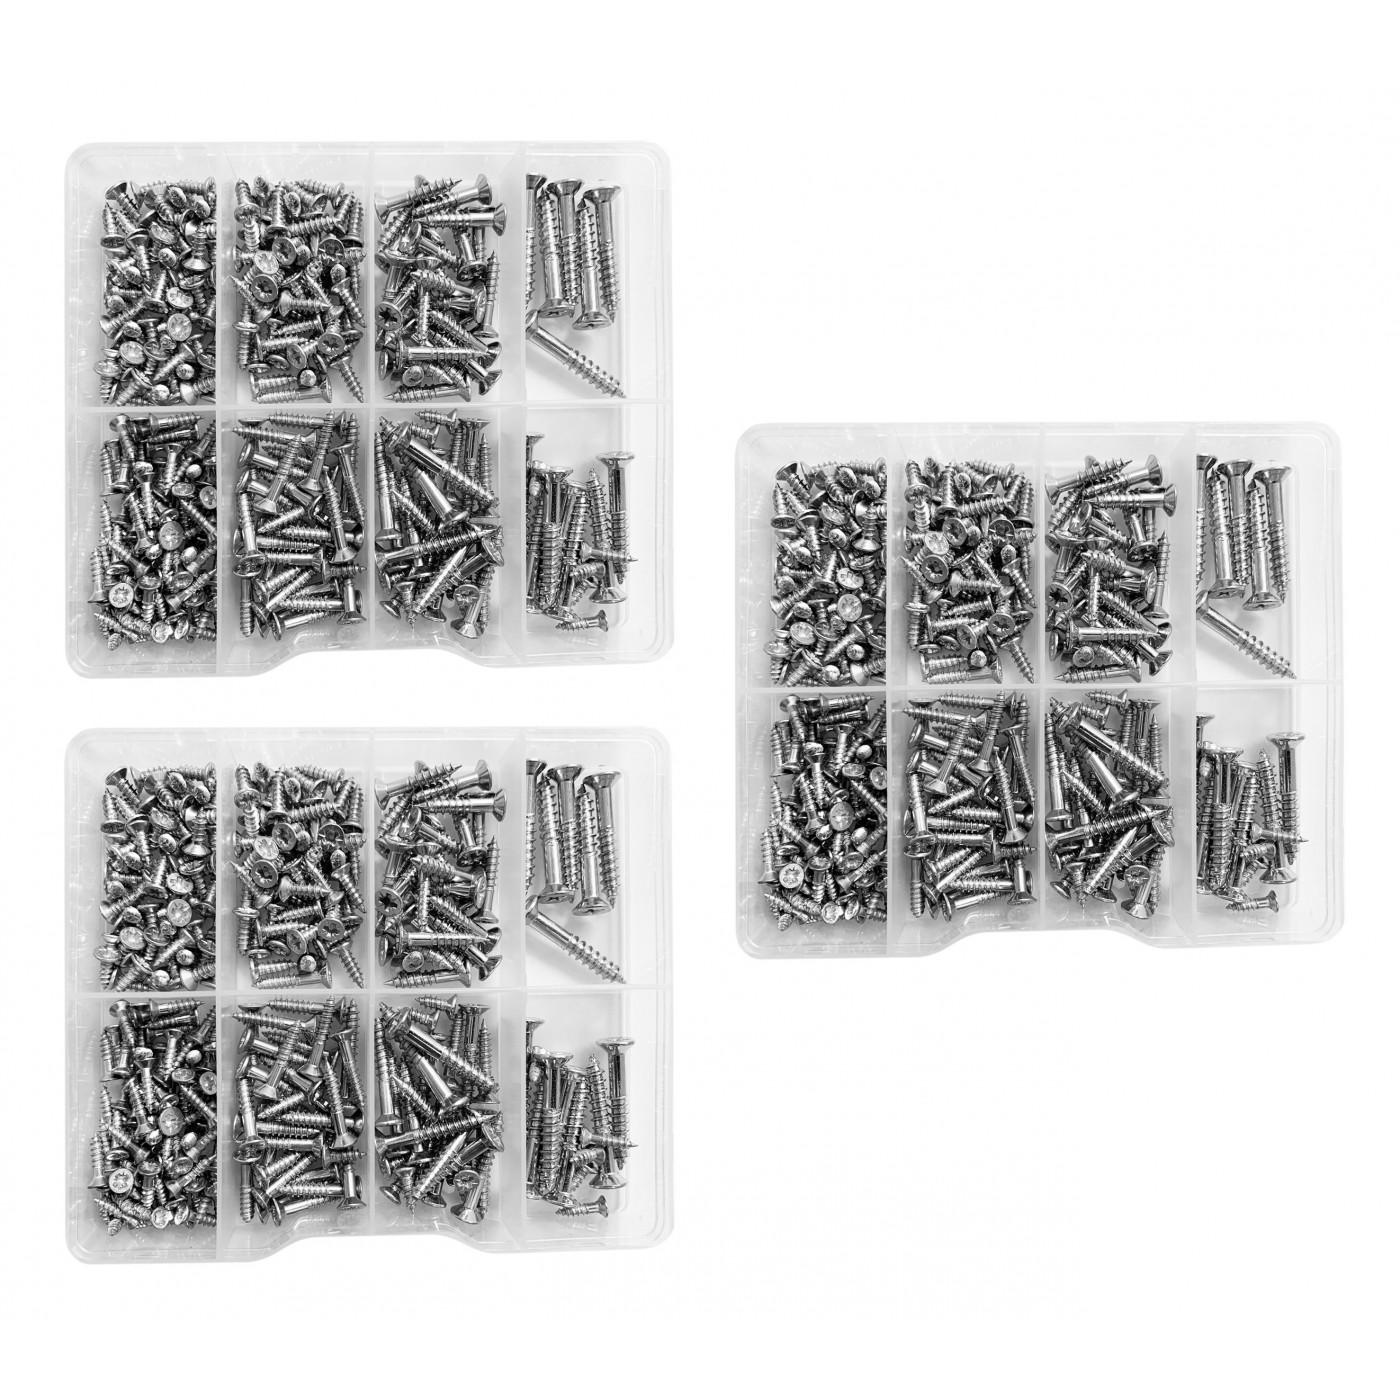 Set of 795 screws in plastic assortment boxes (2.8-5.0 mm)